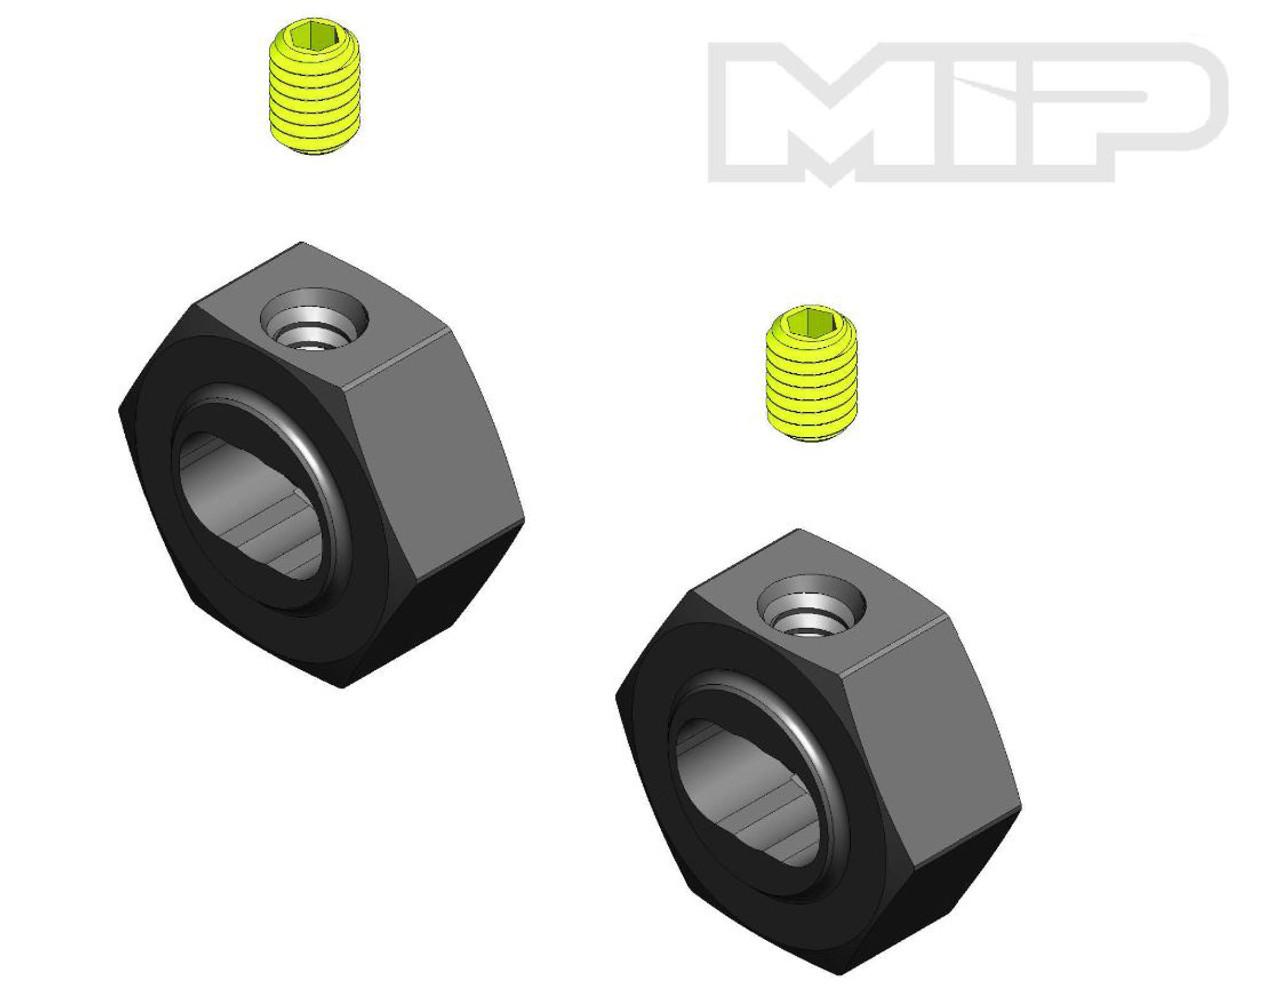 MIP 12140 12mm X-DUTY Keyed CVD Hex Adapter Set 2